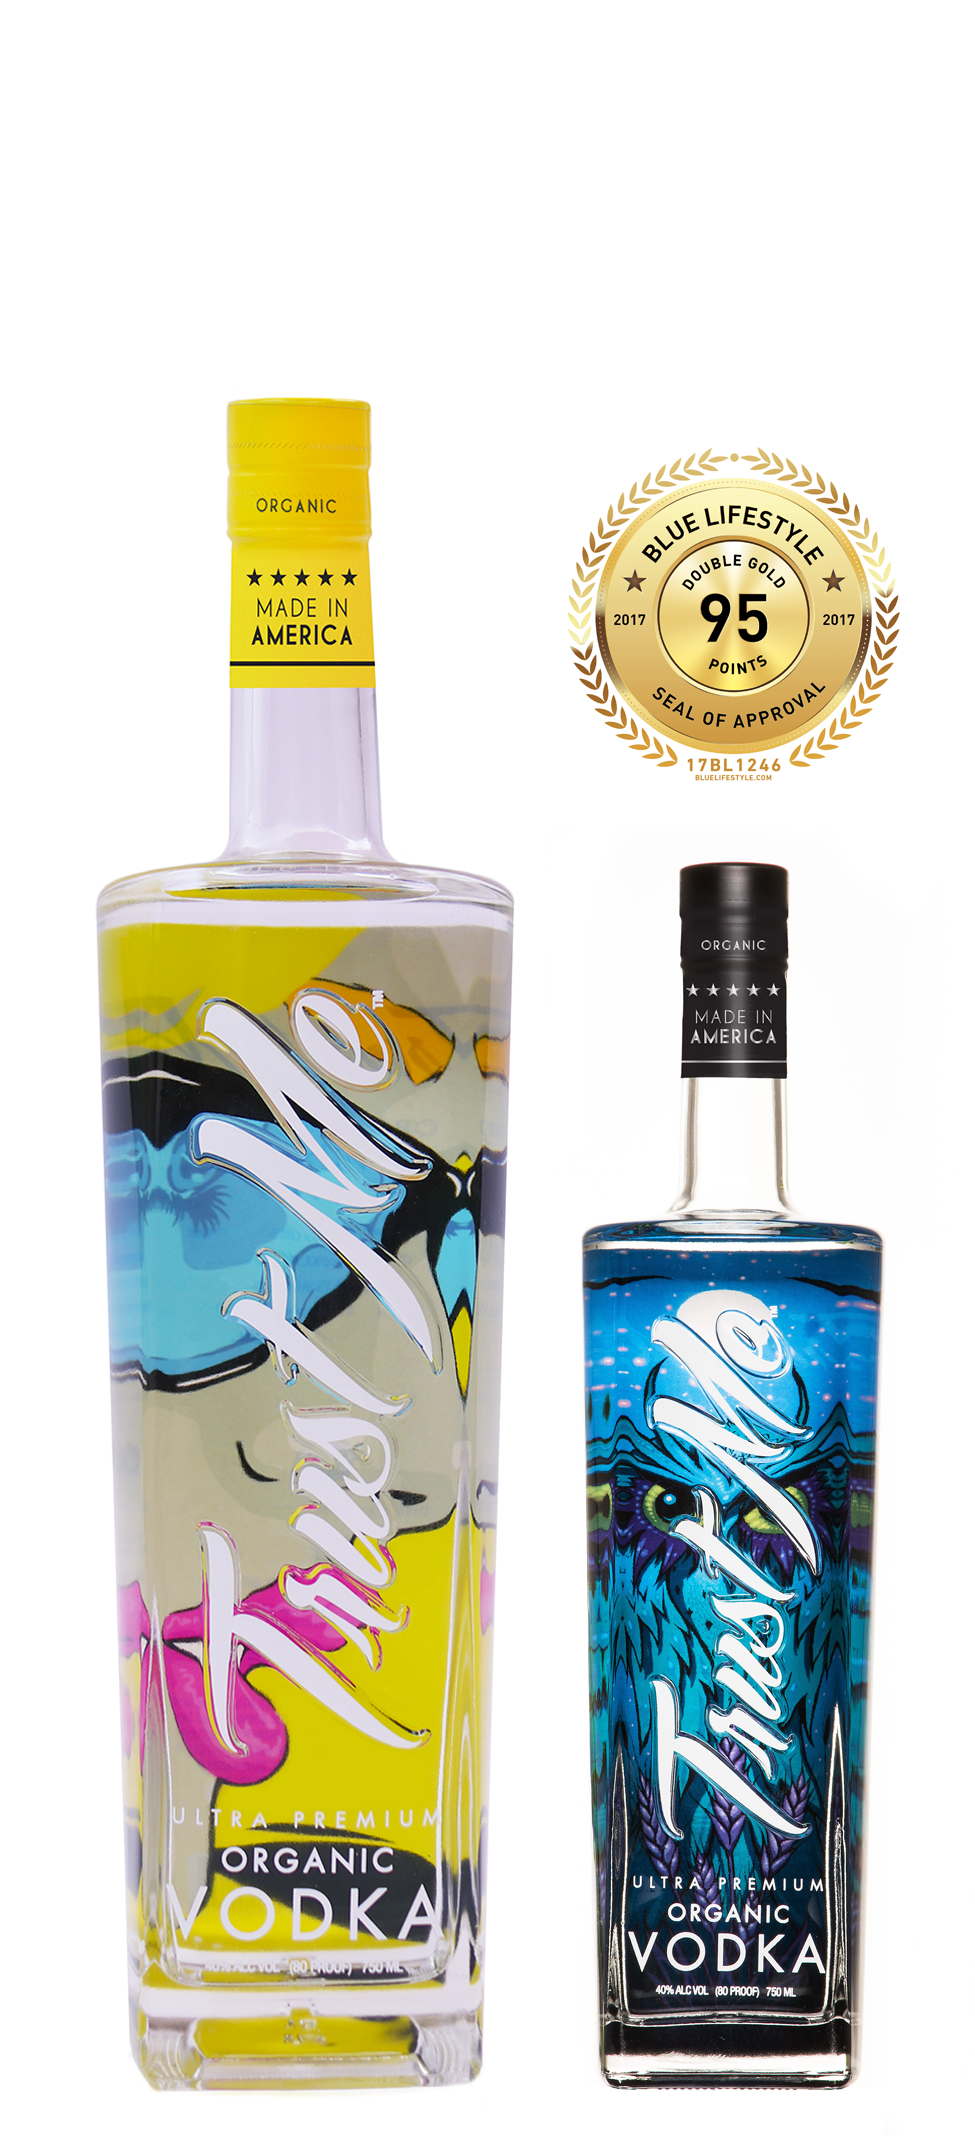 Trust Me Vodka Certified Organic Vodka